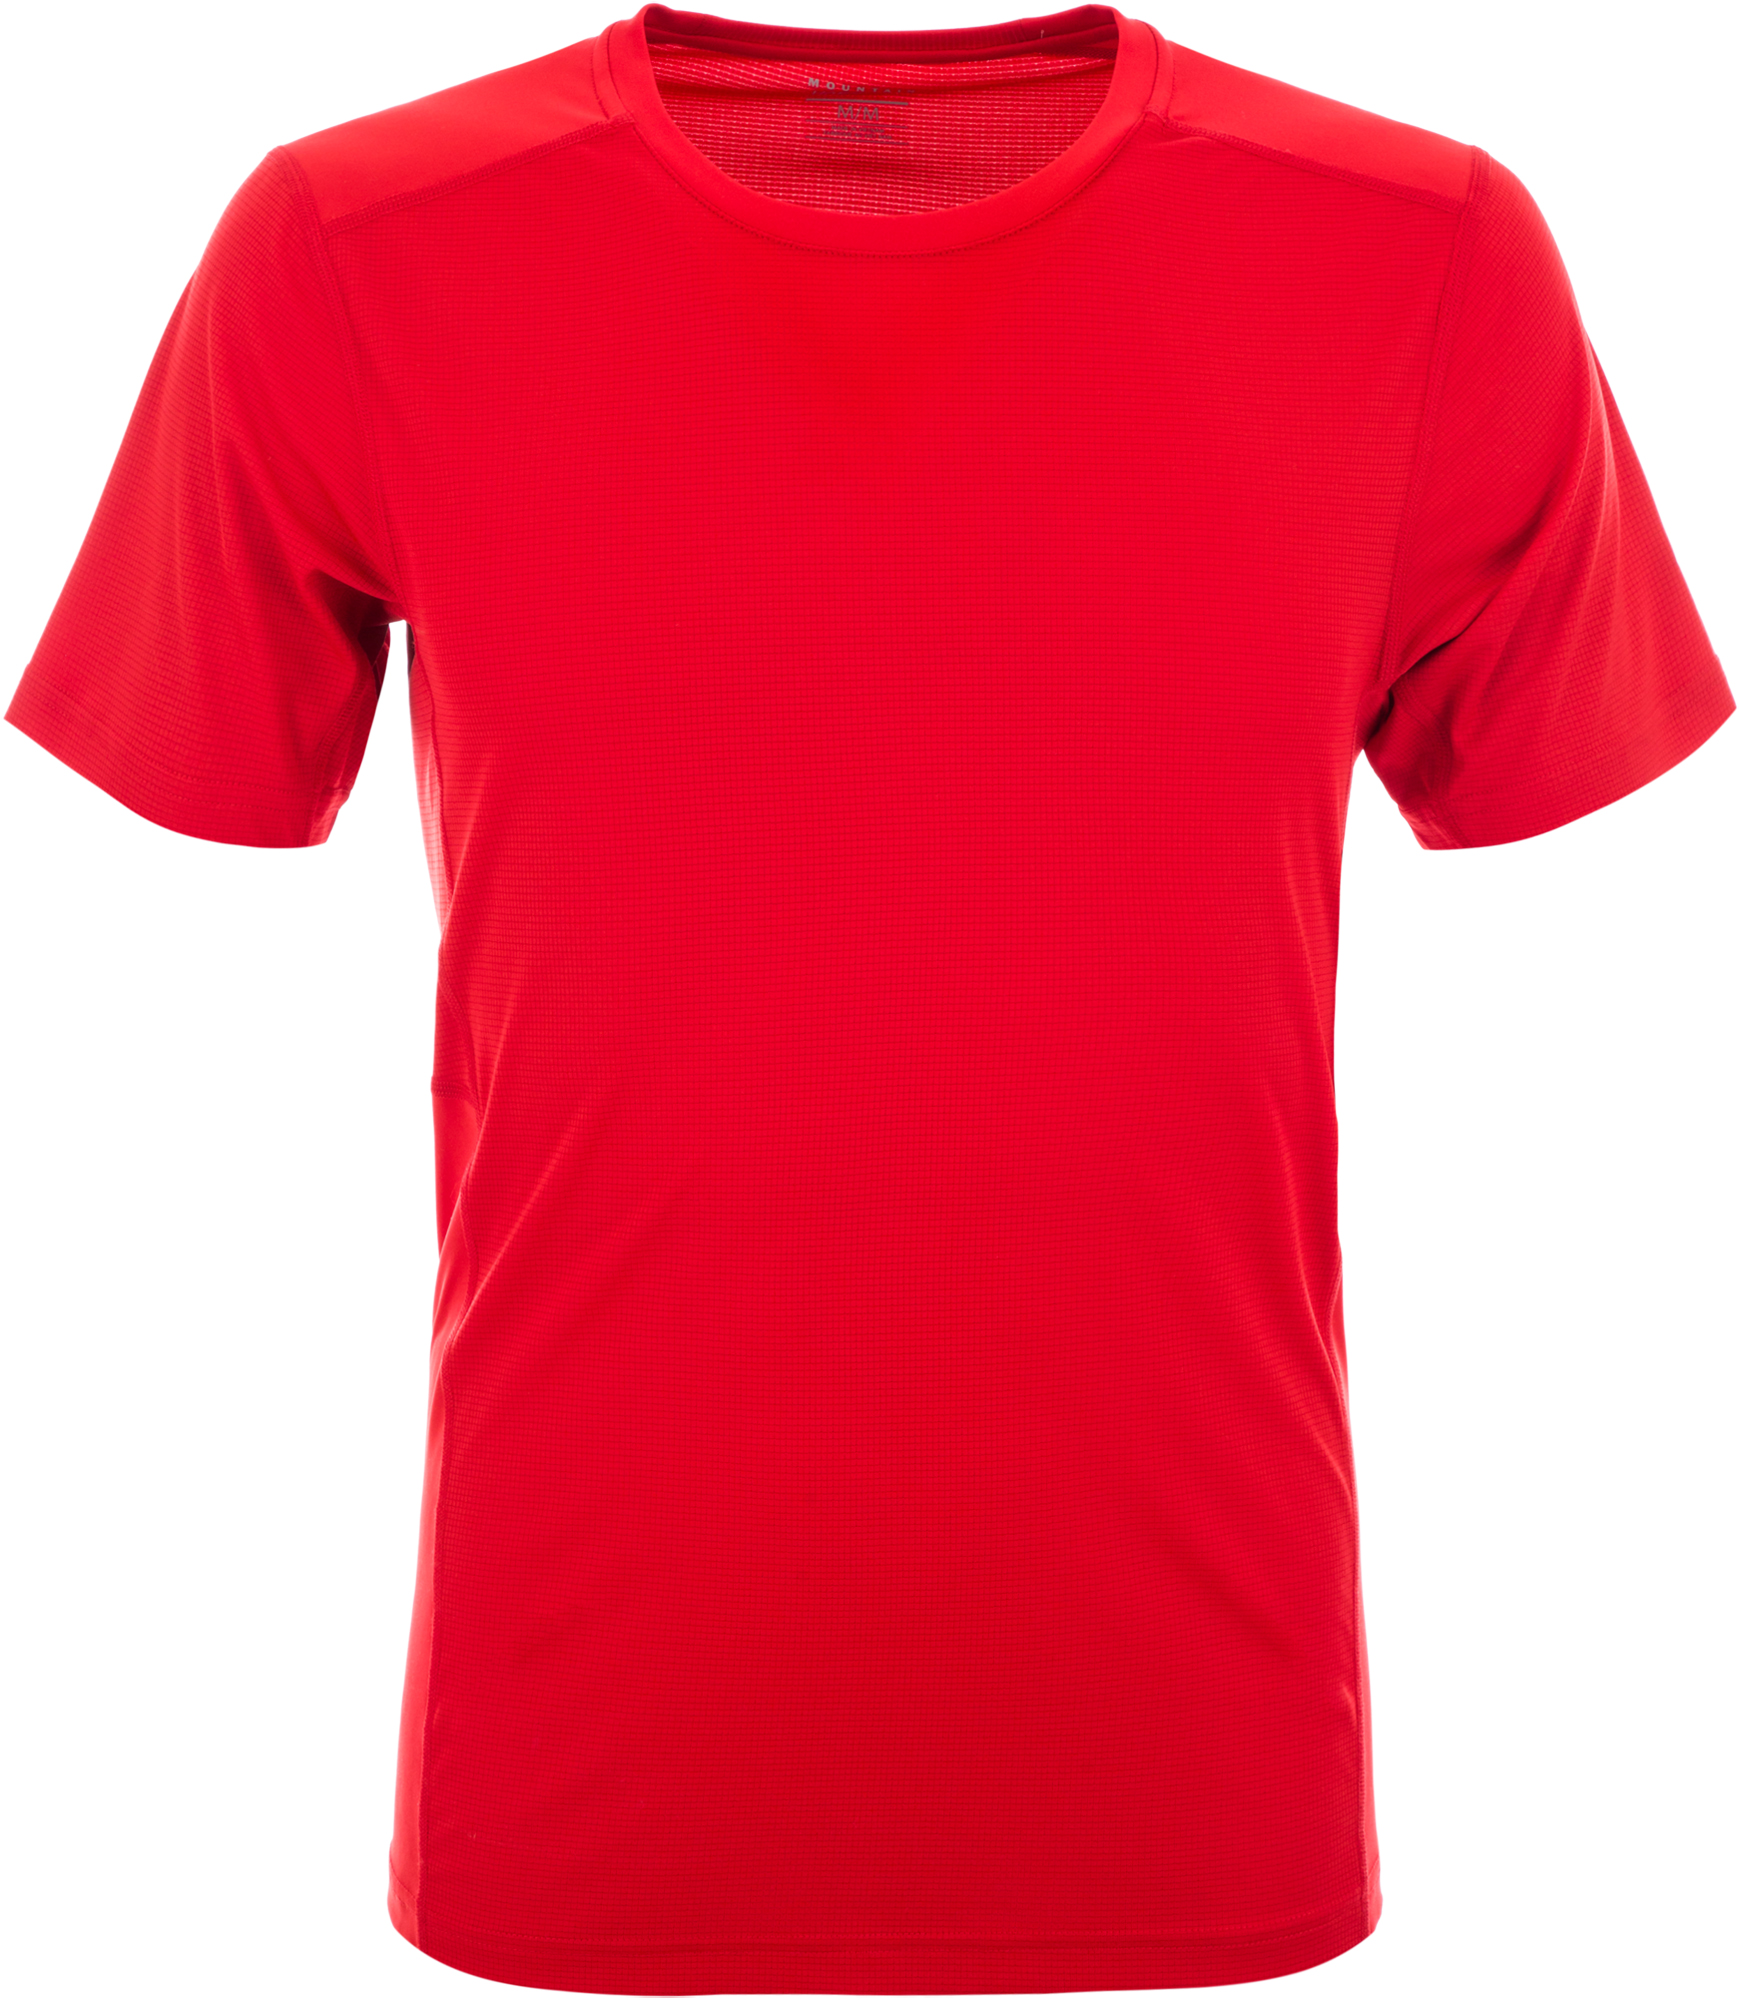 Mountain Hardwear Футболка мужская Photon, размер 56